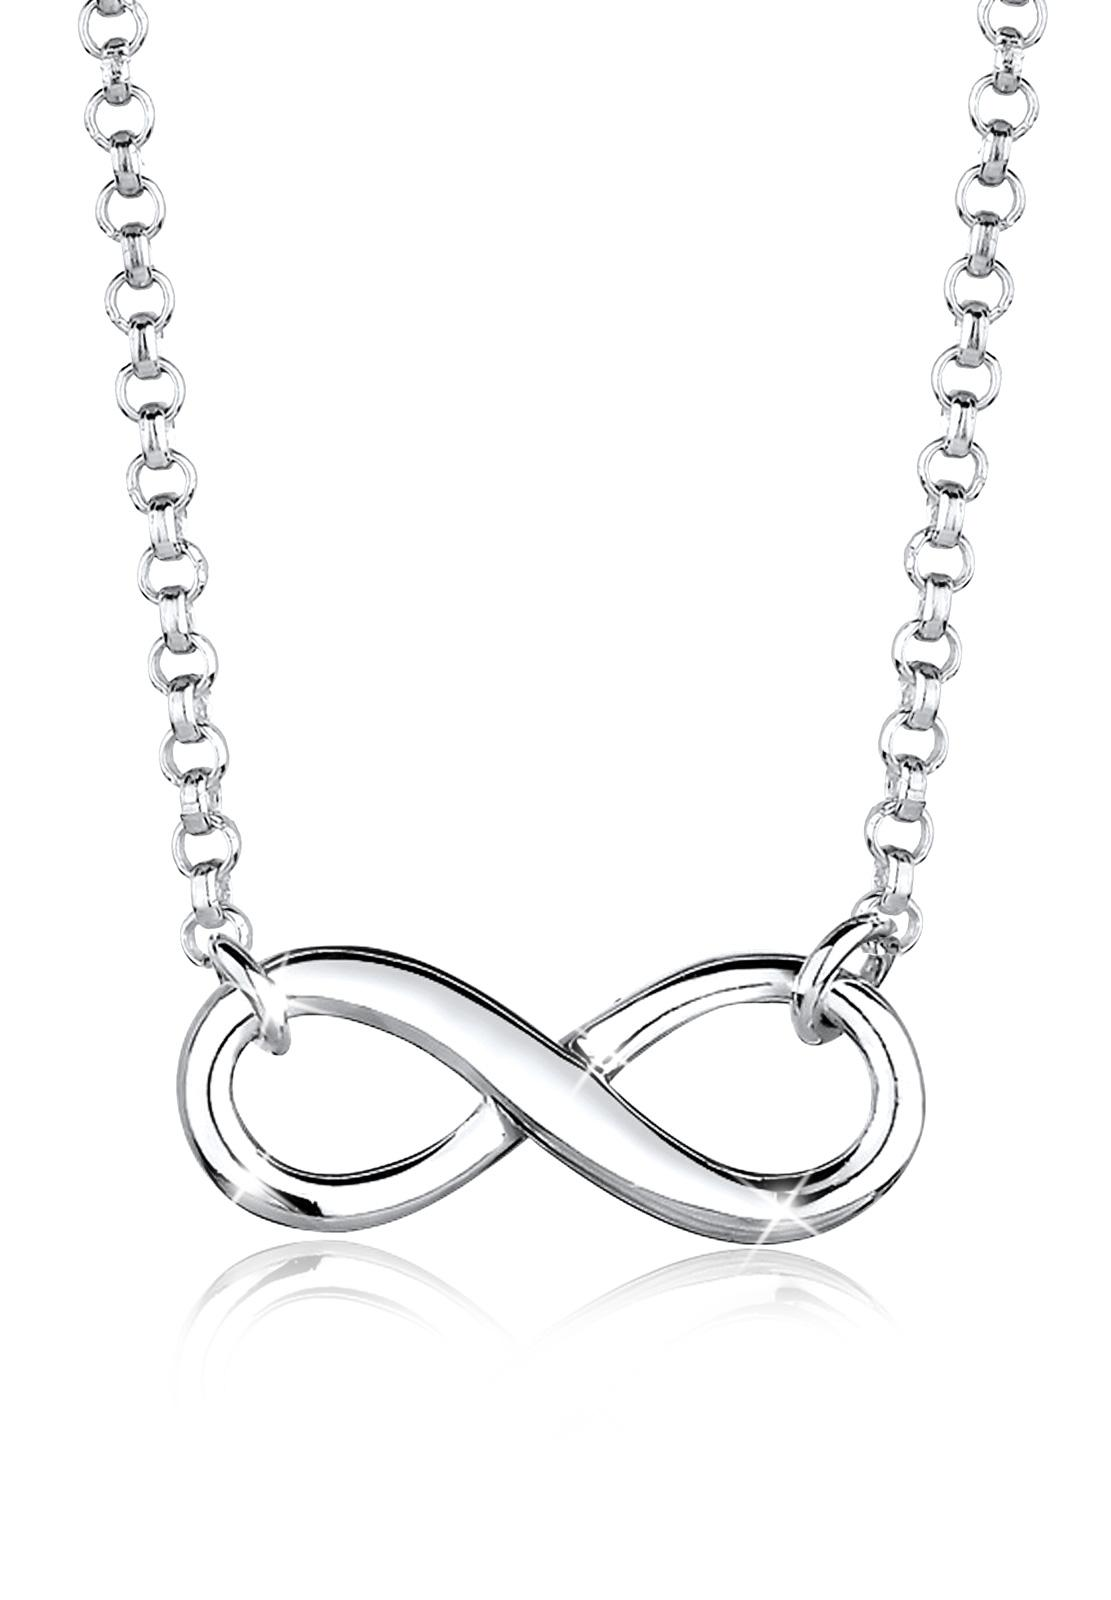 Ulasan Tentang Elli Germany 925 Sterling Silver Kalung Infinity Silver